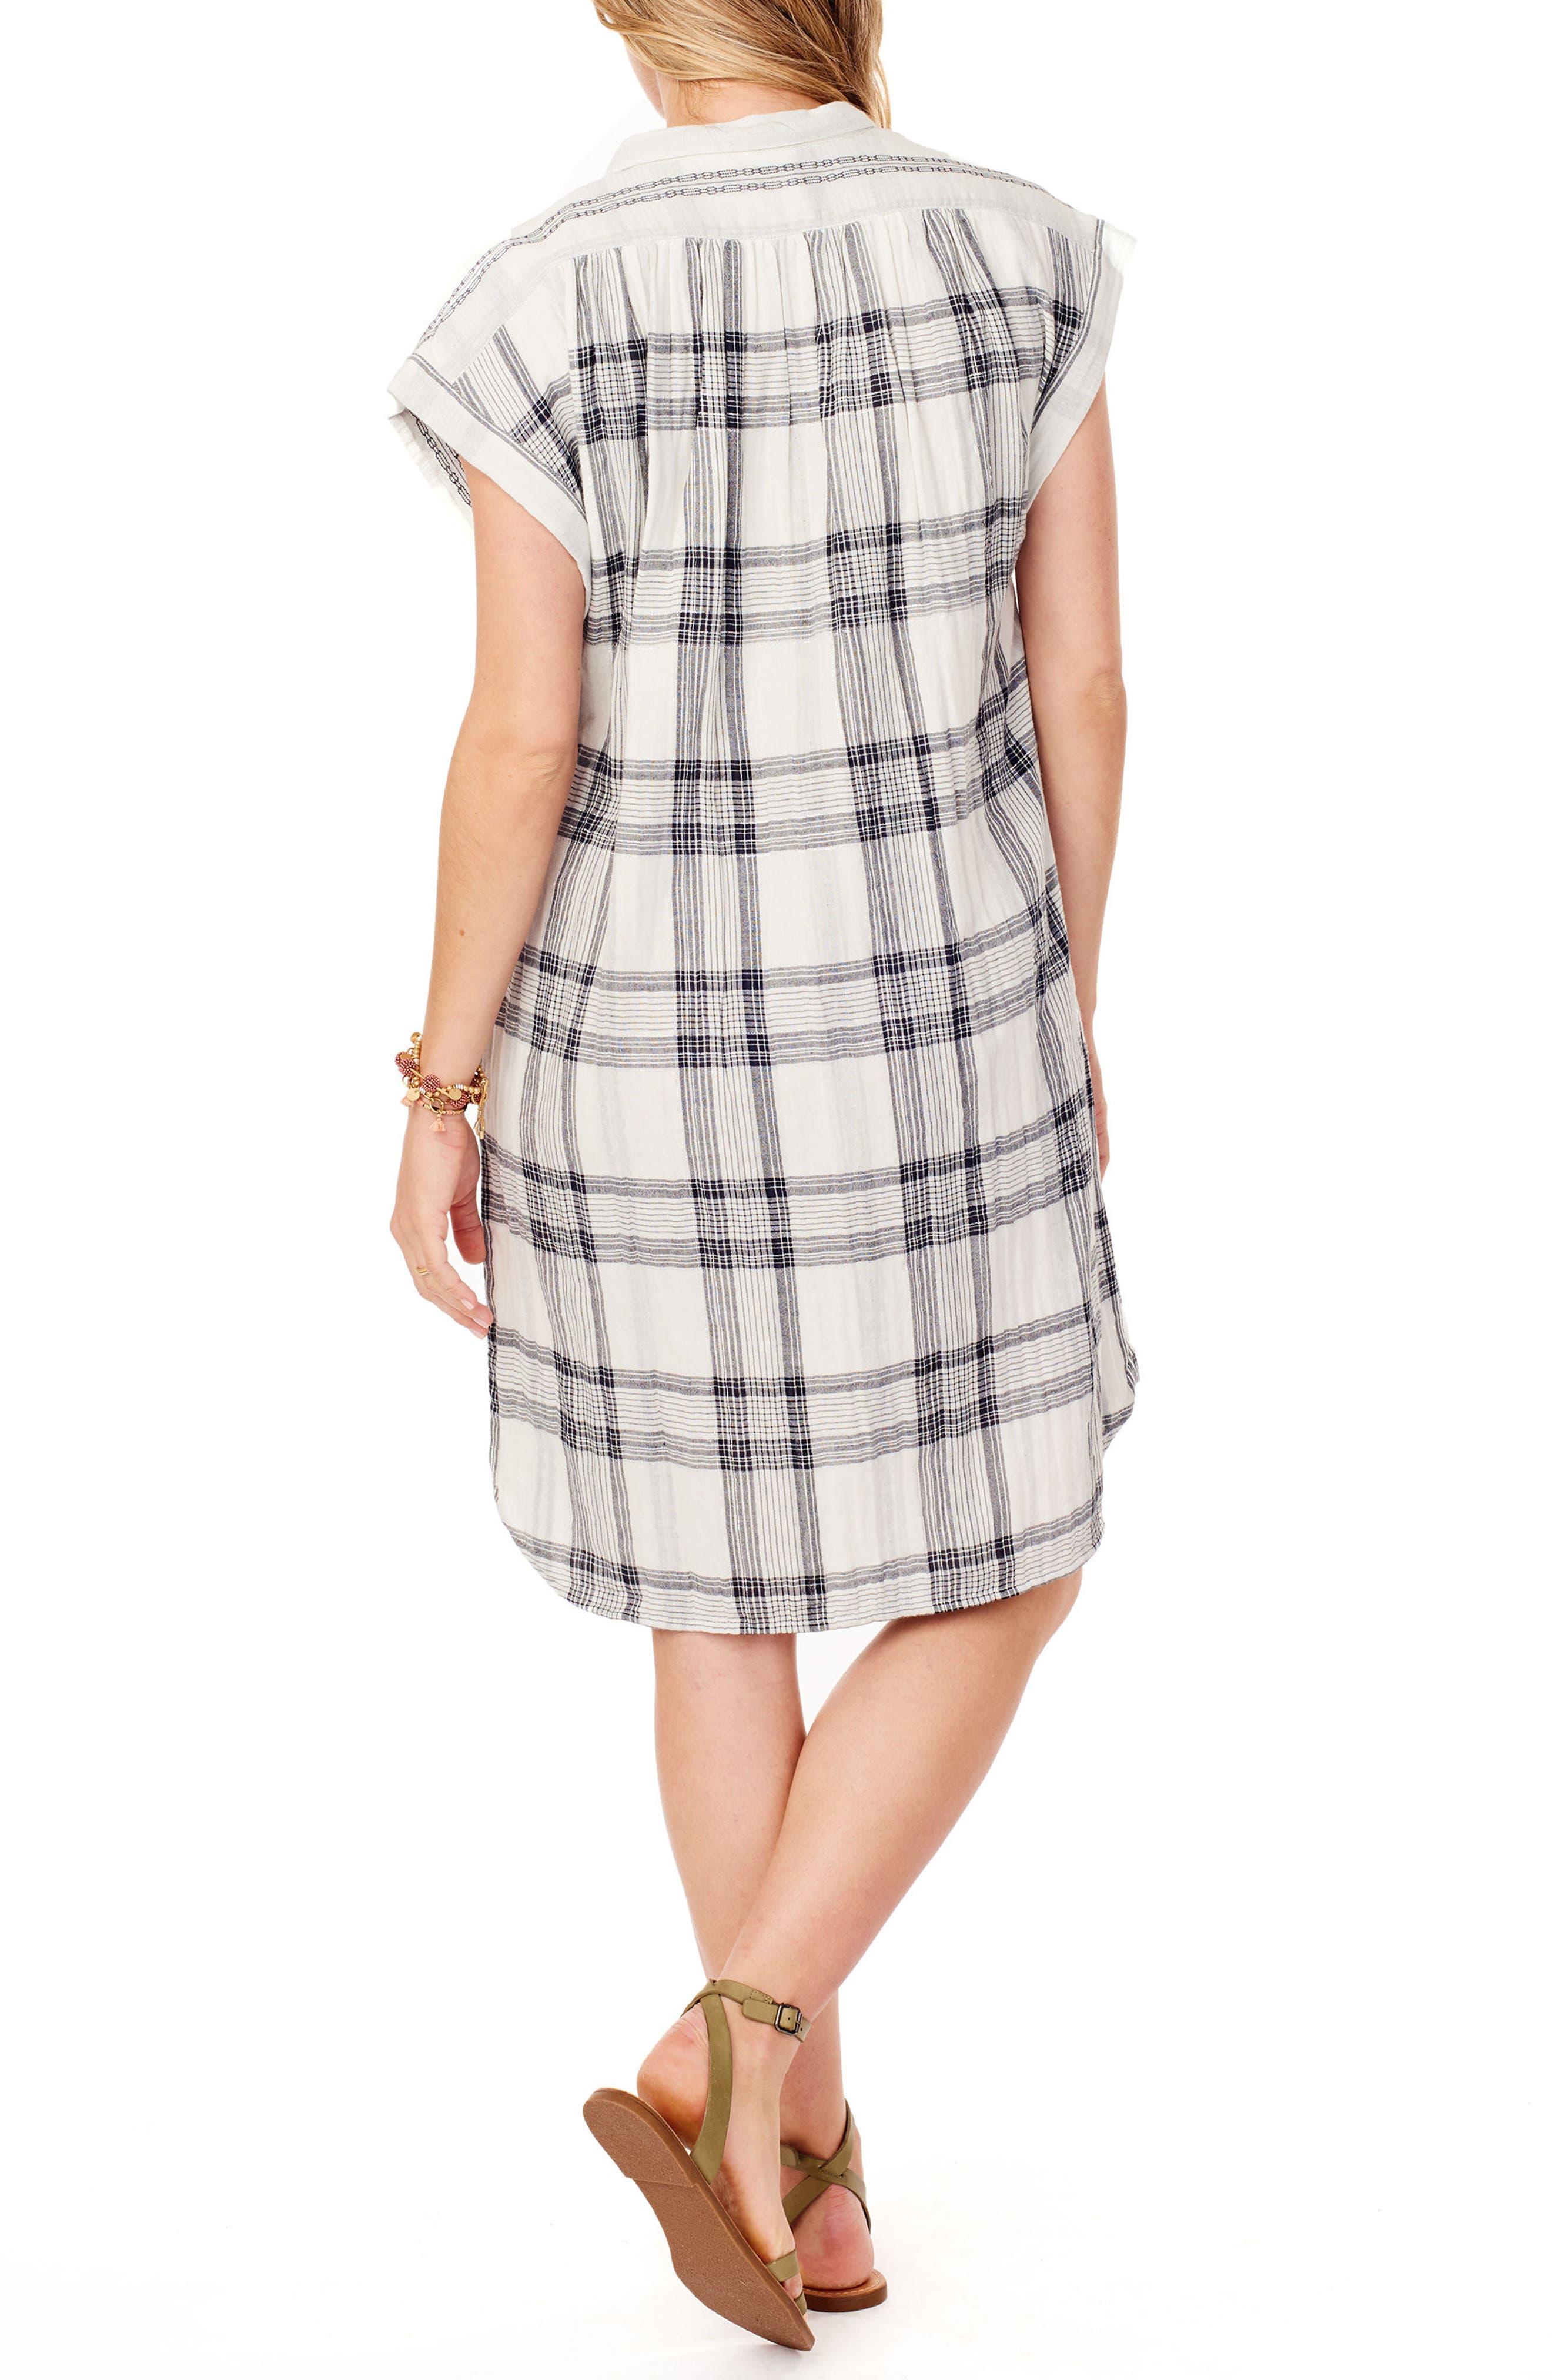 Ingrid & Isabel Maternity Shift Dress,                             Alternate thumbnail 2, color,                             WHITE/ BLACK LUREX PLAID